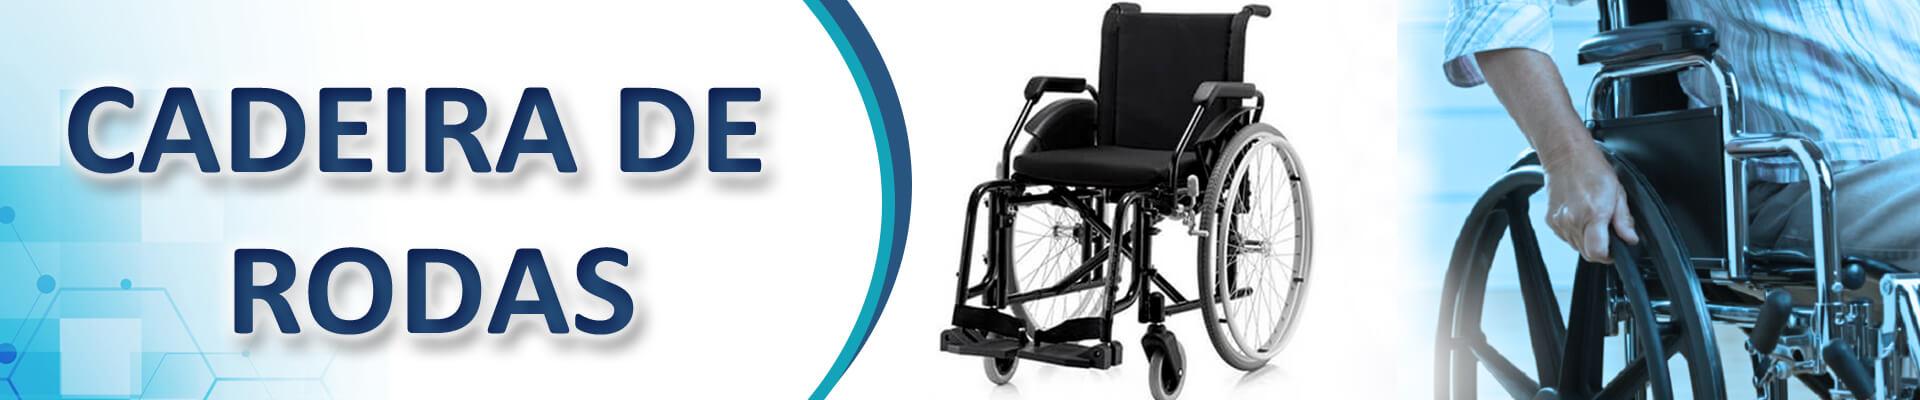 Banner principal da categoria cadeiras de rodas